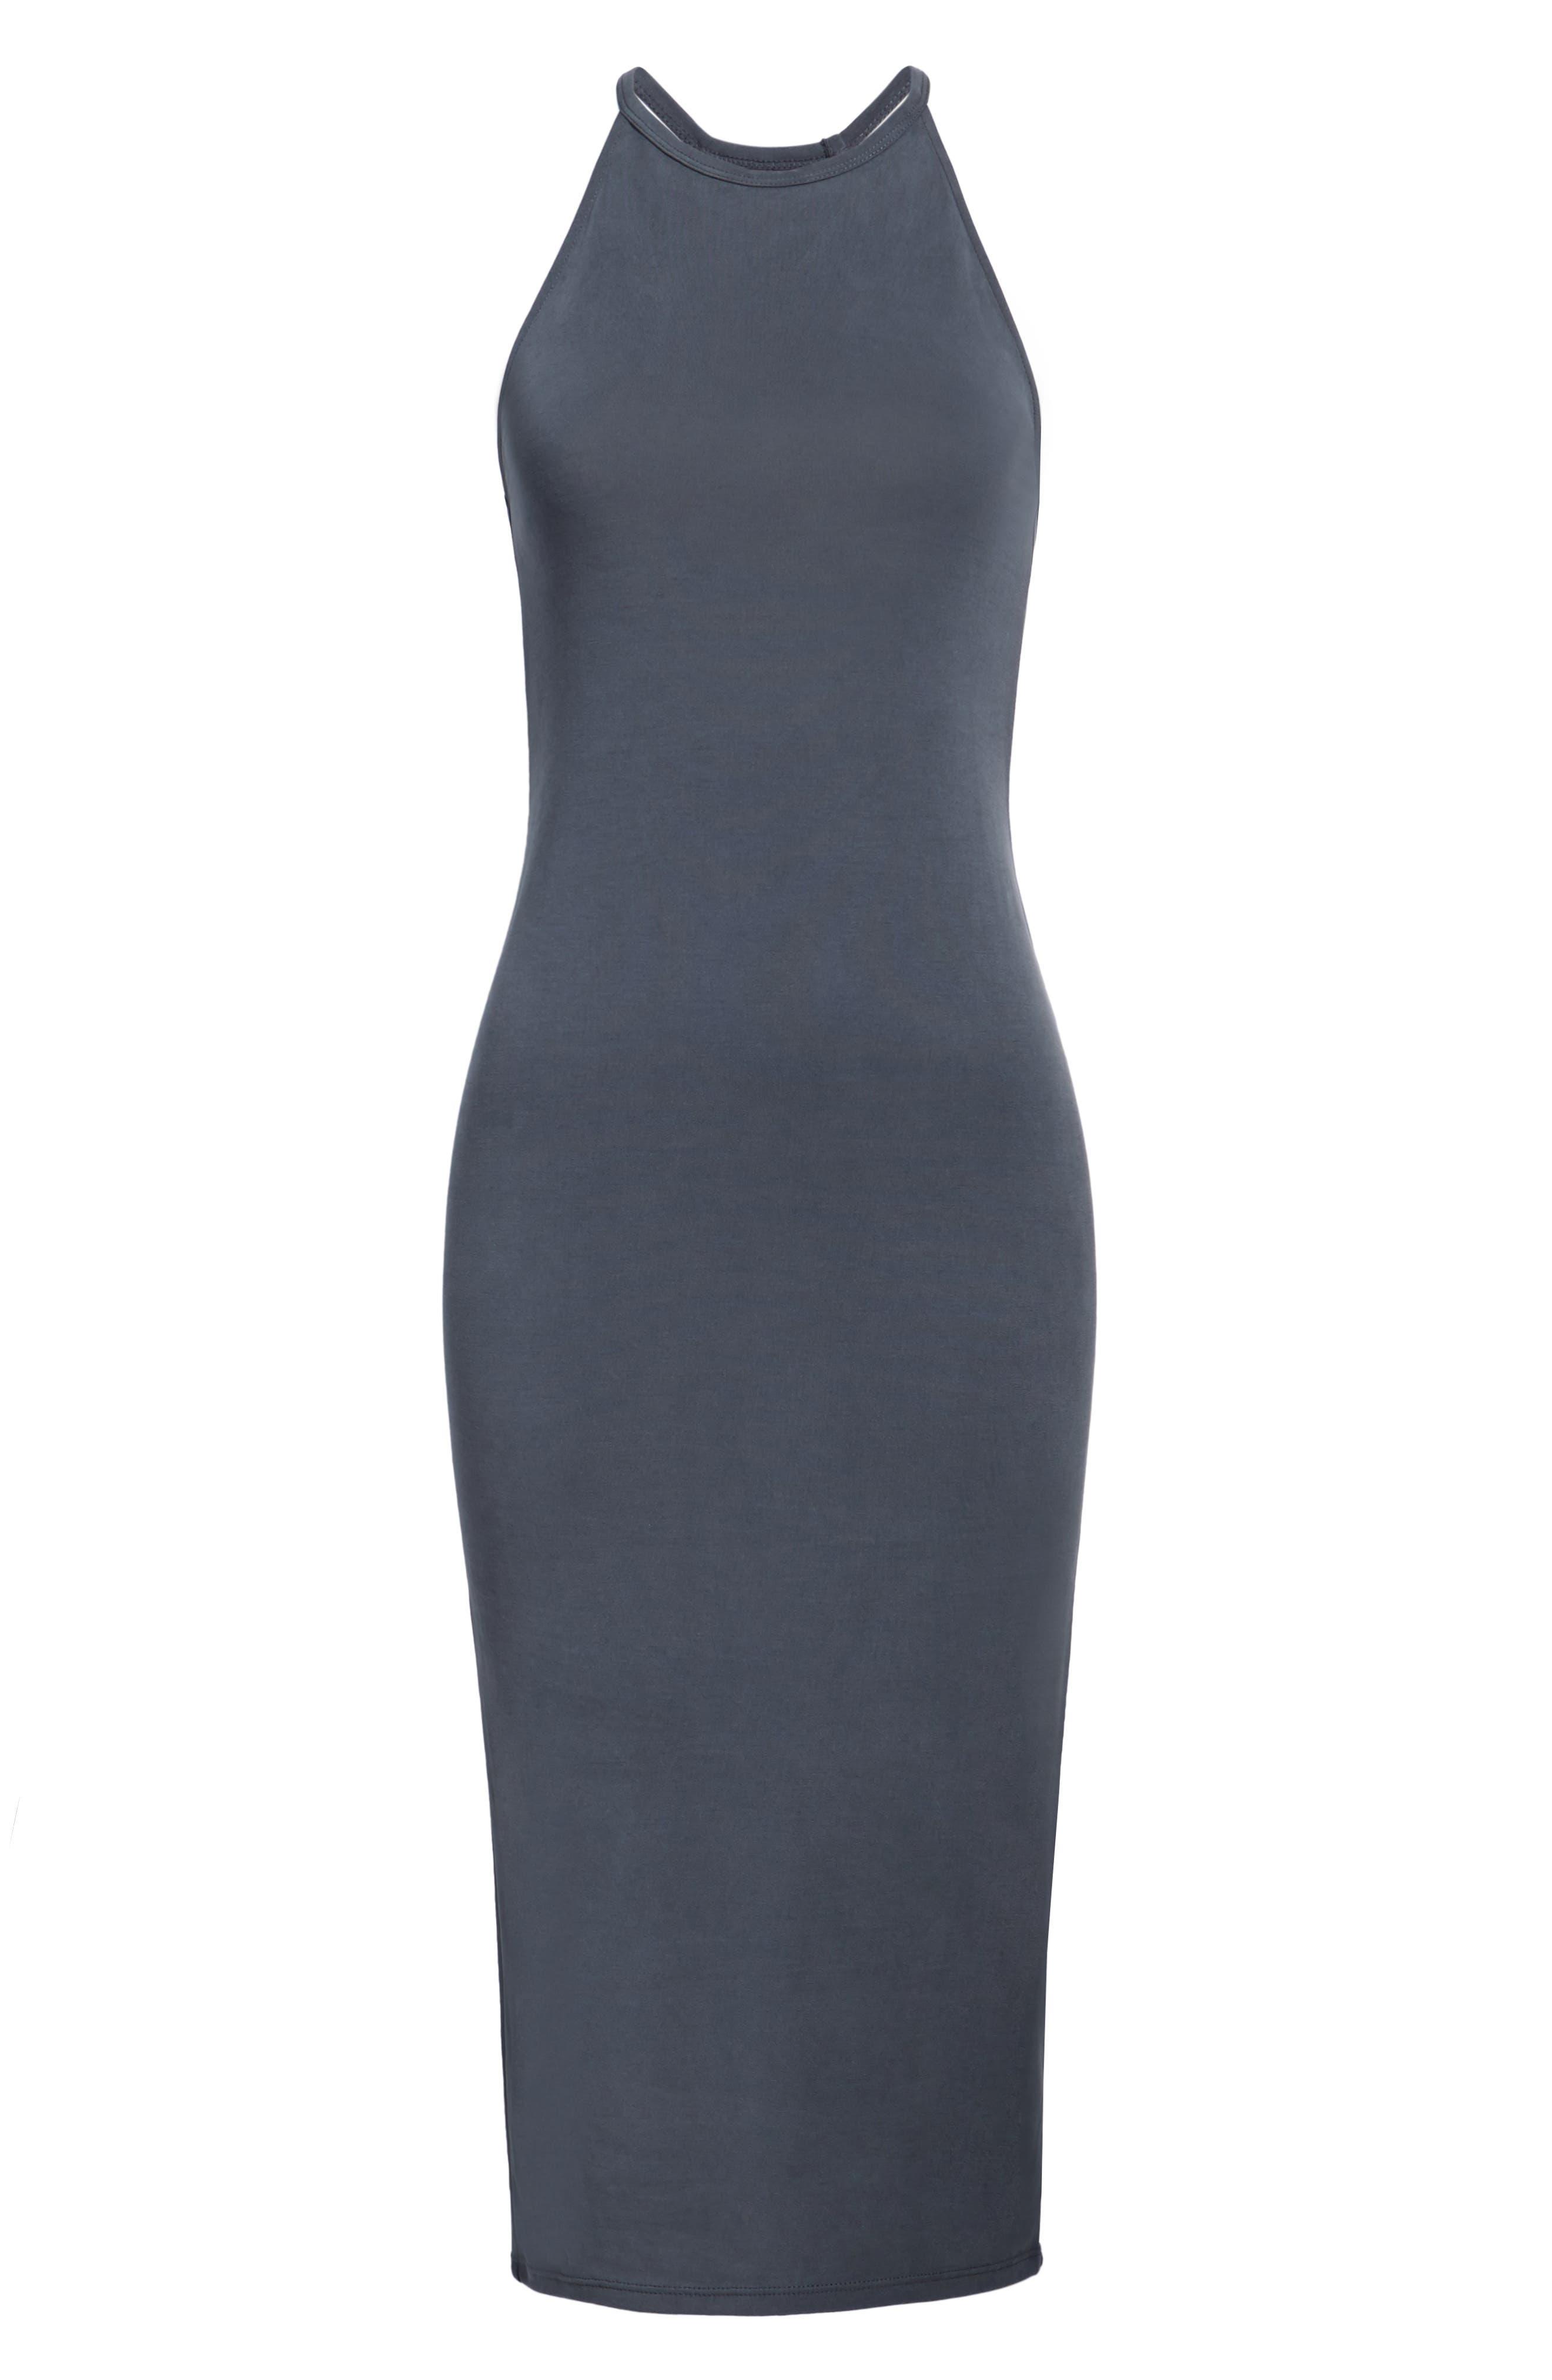 Cutaway Tank Dress,                             Alternate thumbnail 6, color,                             Grey Ebony